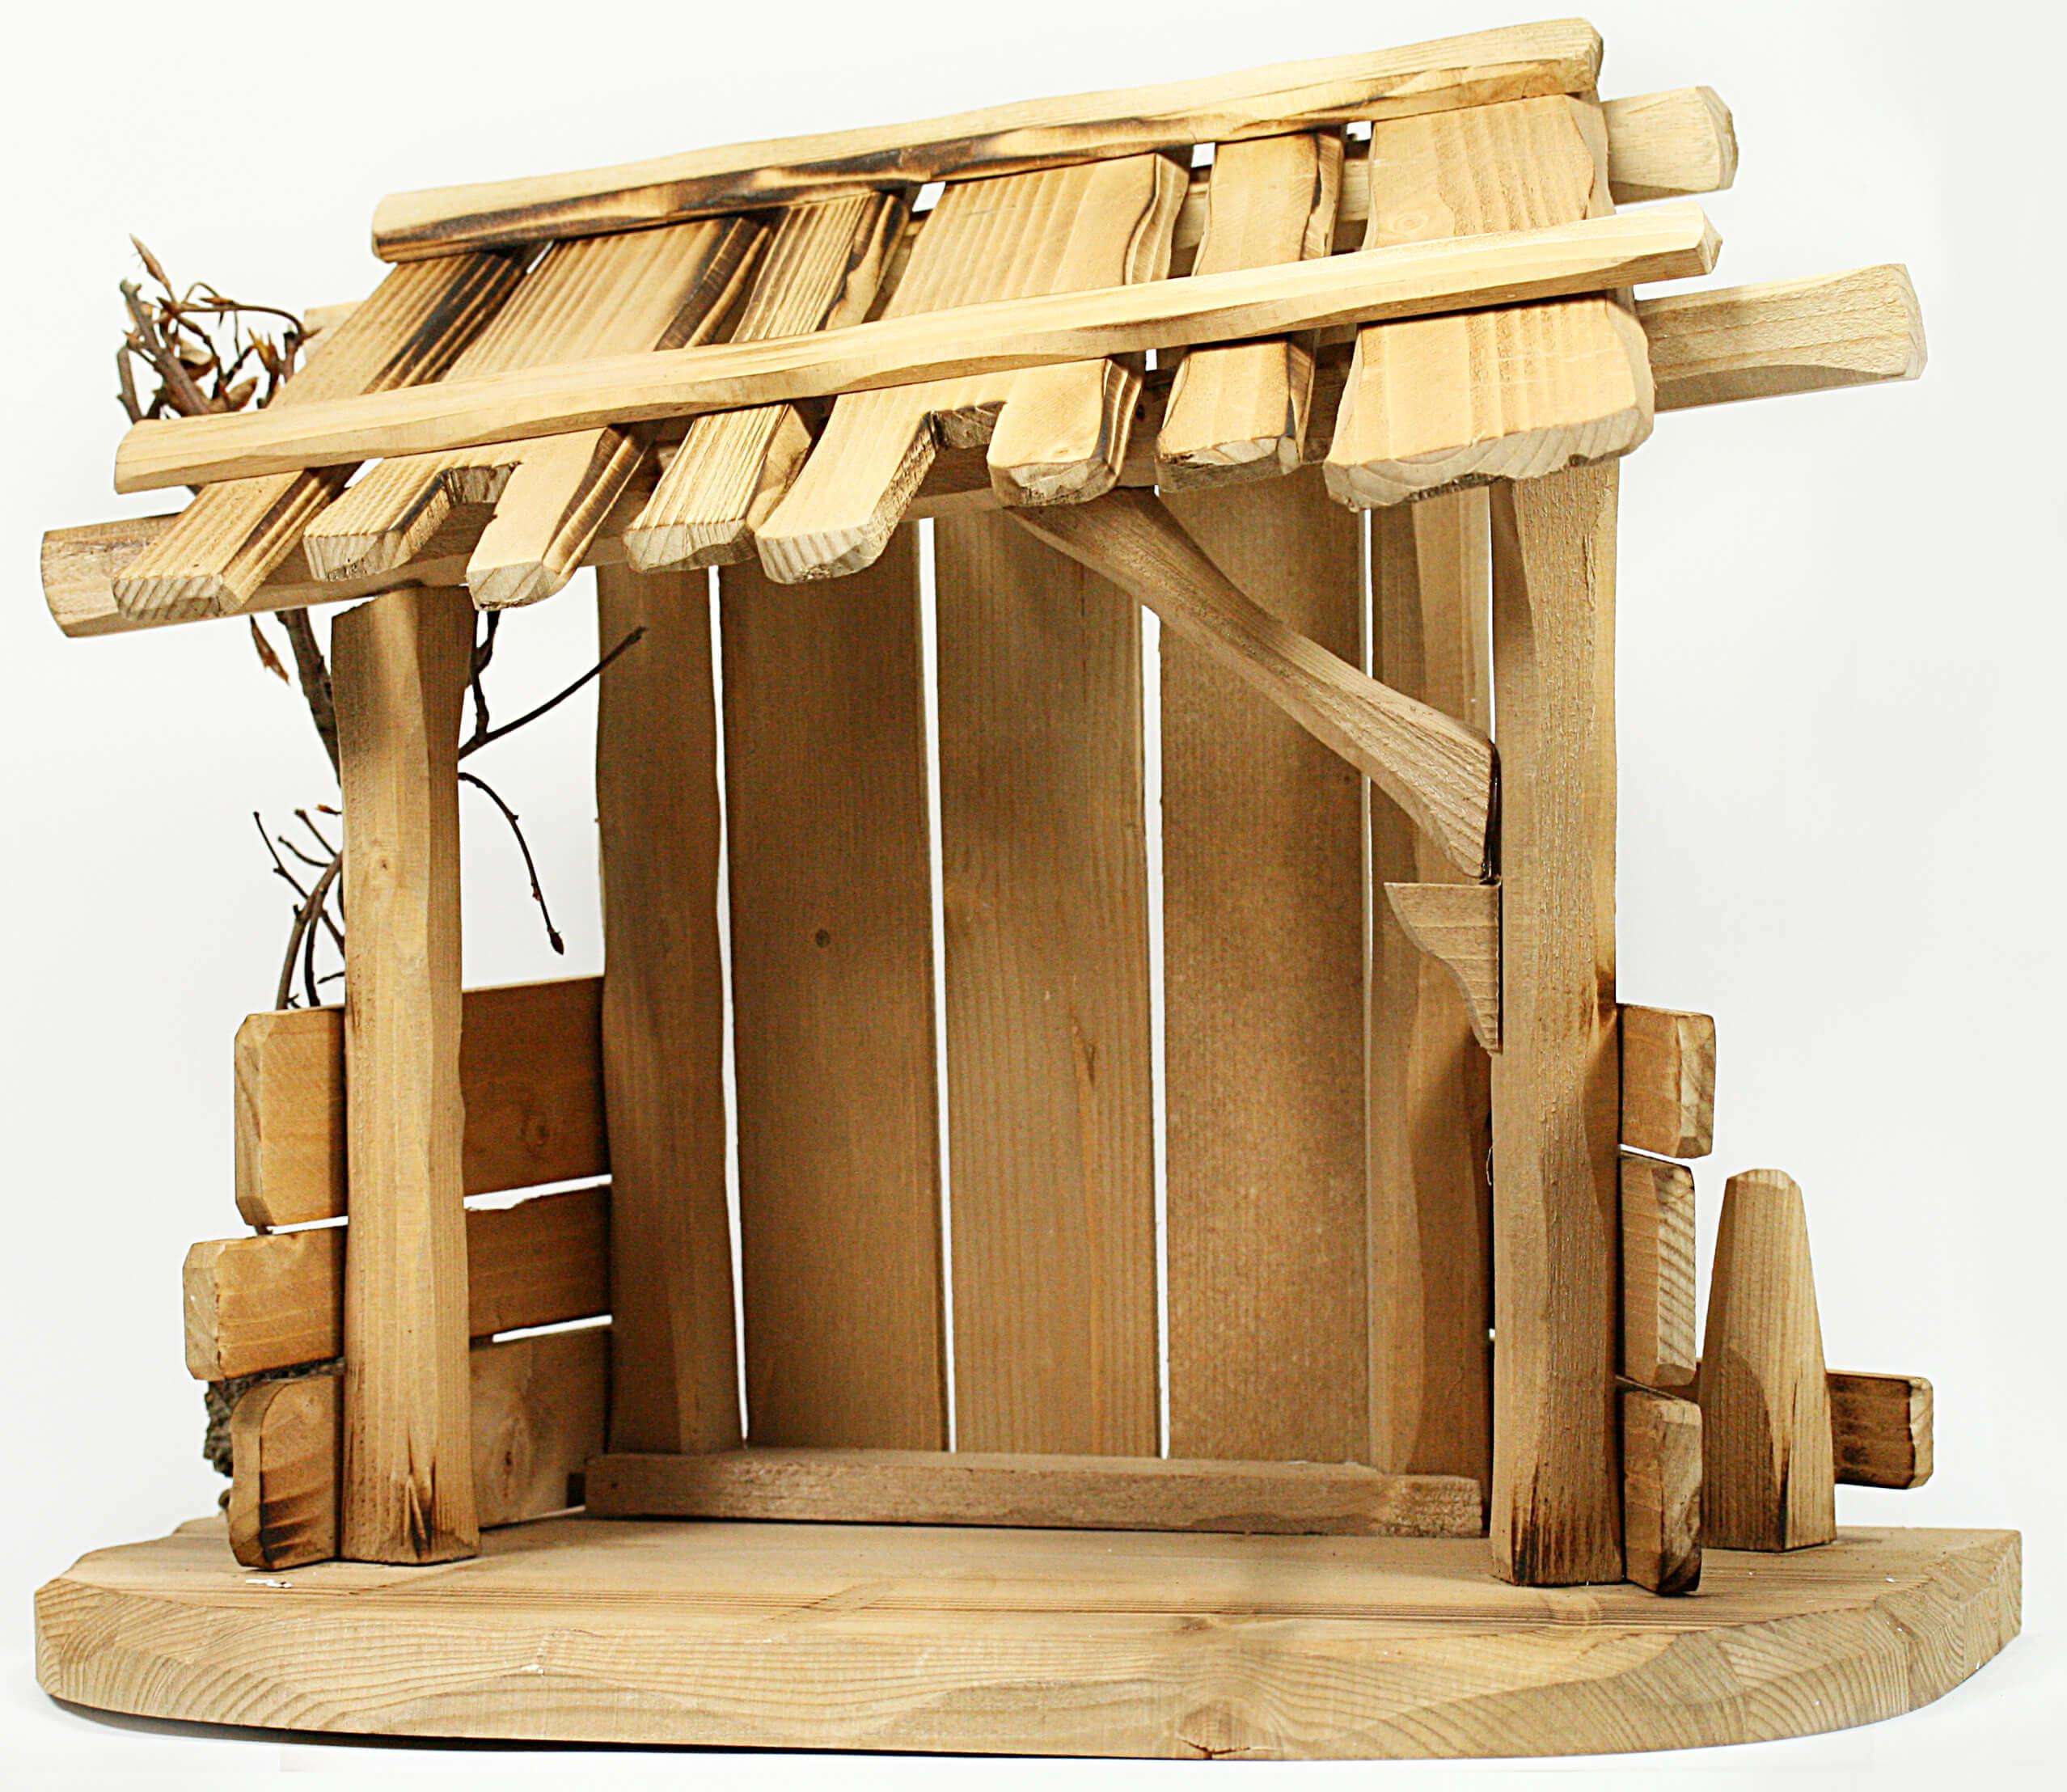 karl kuolt krippe stall 7 5 cm serie natur. Black Bedroom Furniture Sets. Home Design Ideas